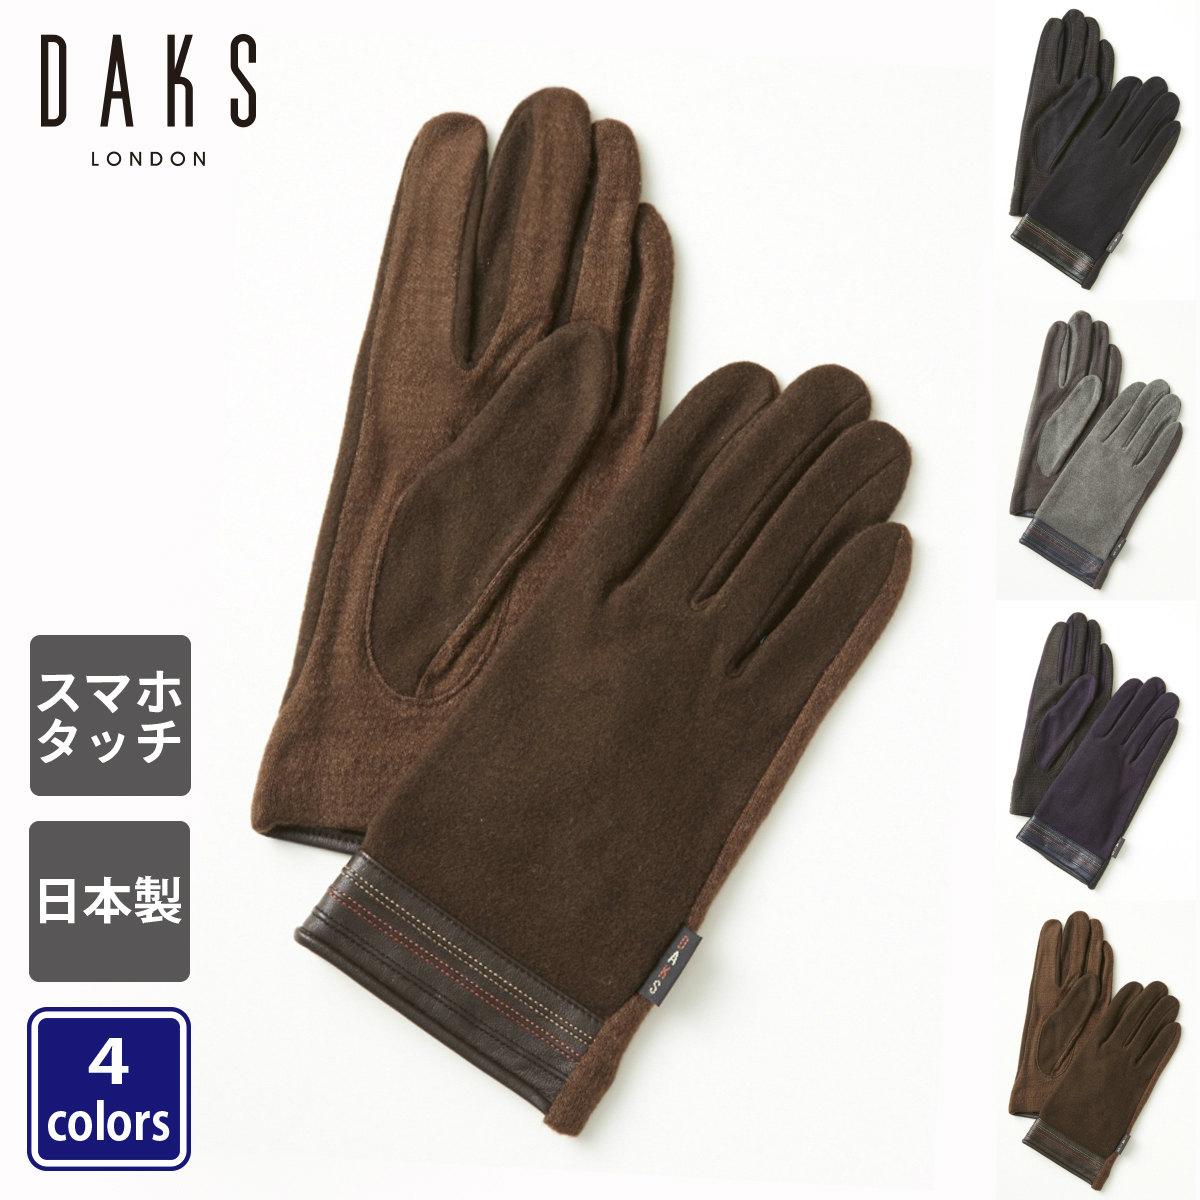 DAKS  柔らか アクリルテンセル メンズ手袋 裾革切替 スマホ タッチパネル対応 日本製 23〜24cm(M) 全4色